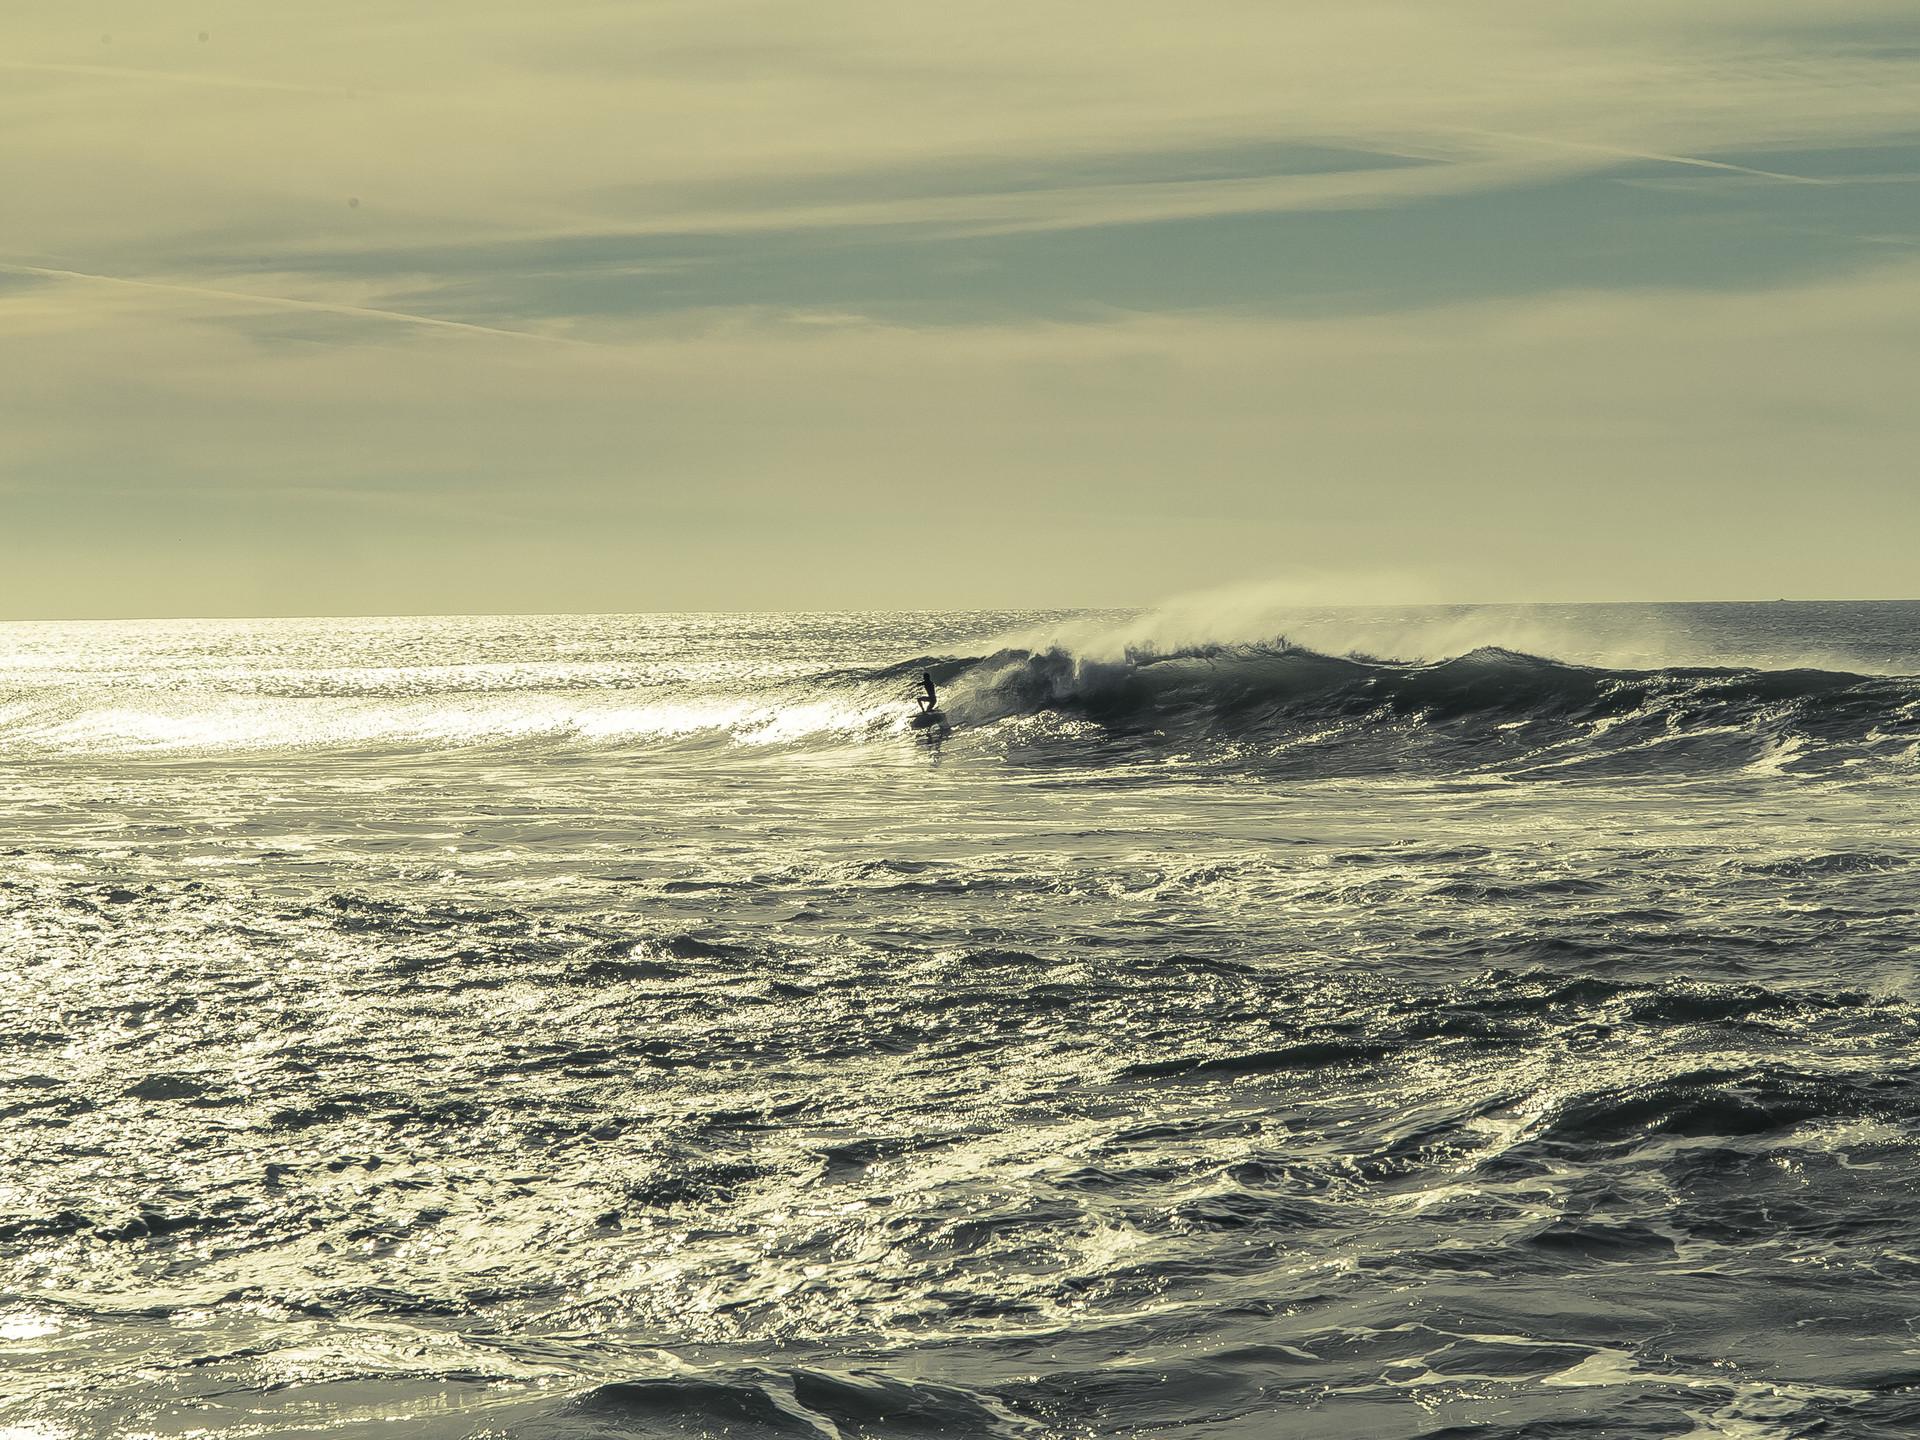 surfing-lisbon-6c3d7a4eb4f32a3f5f1cc20b0